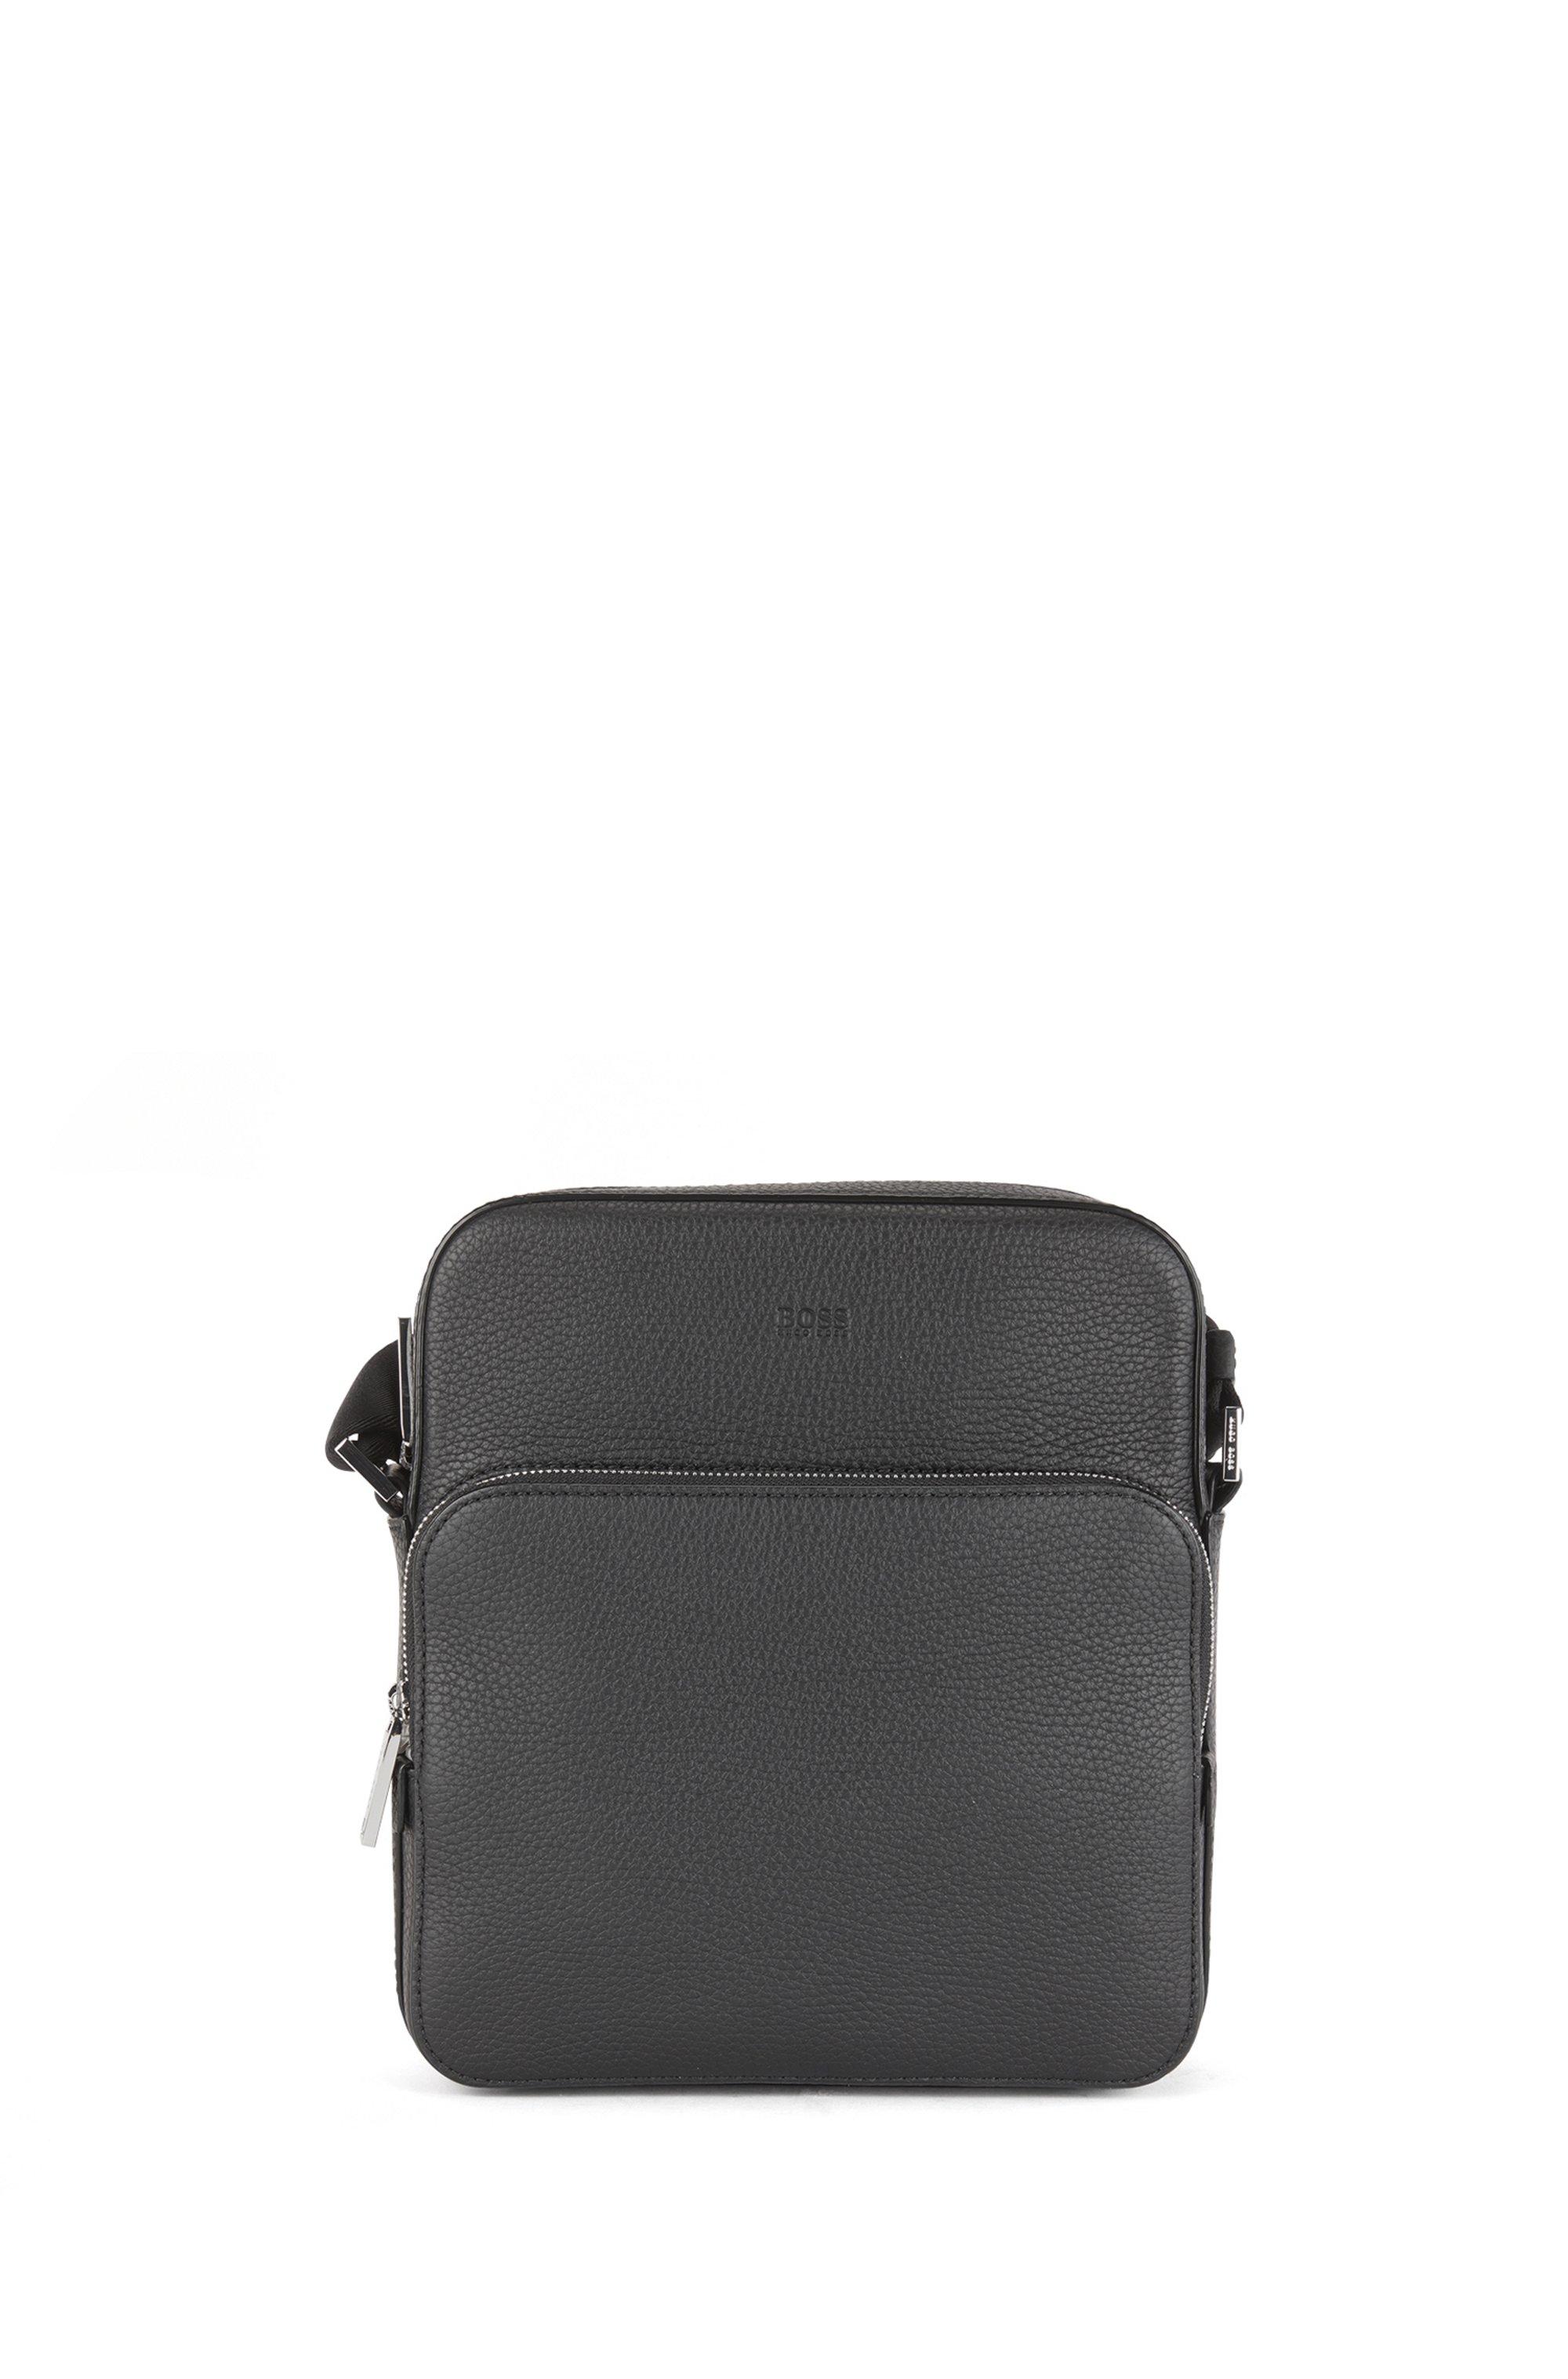 Reporter bag in grained Italian leather, Black